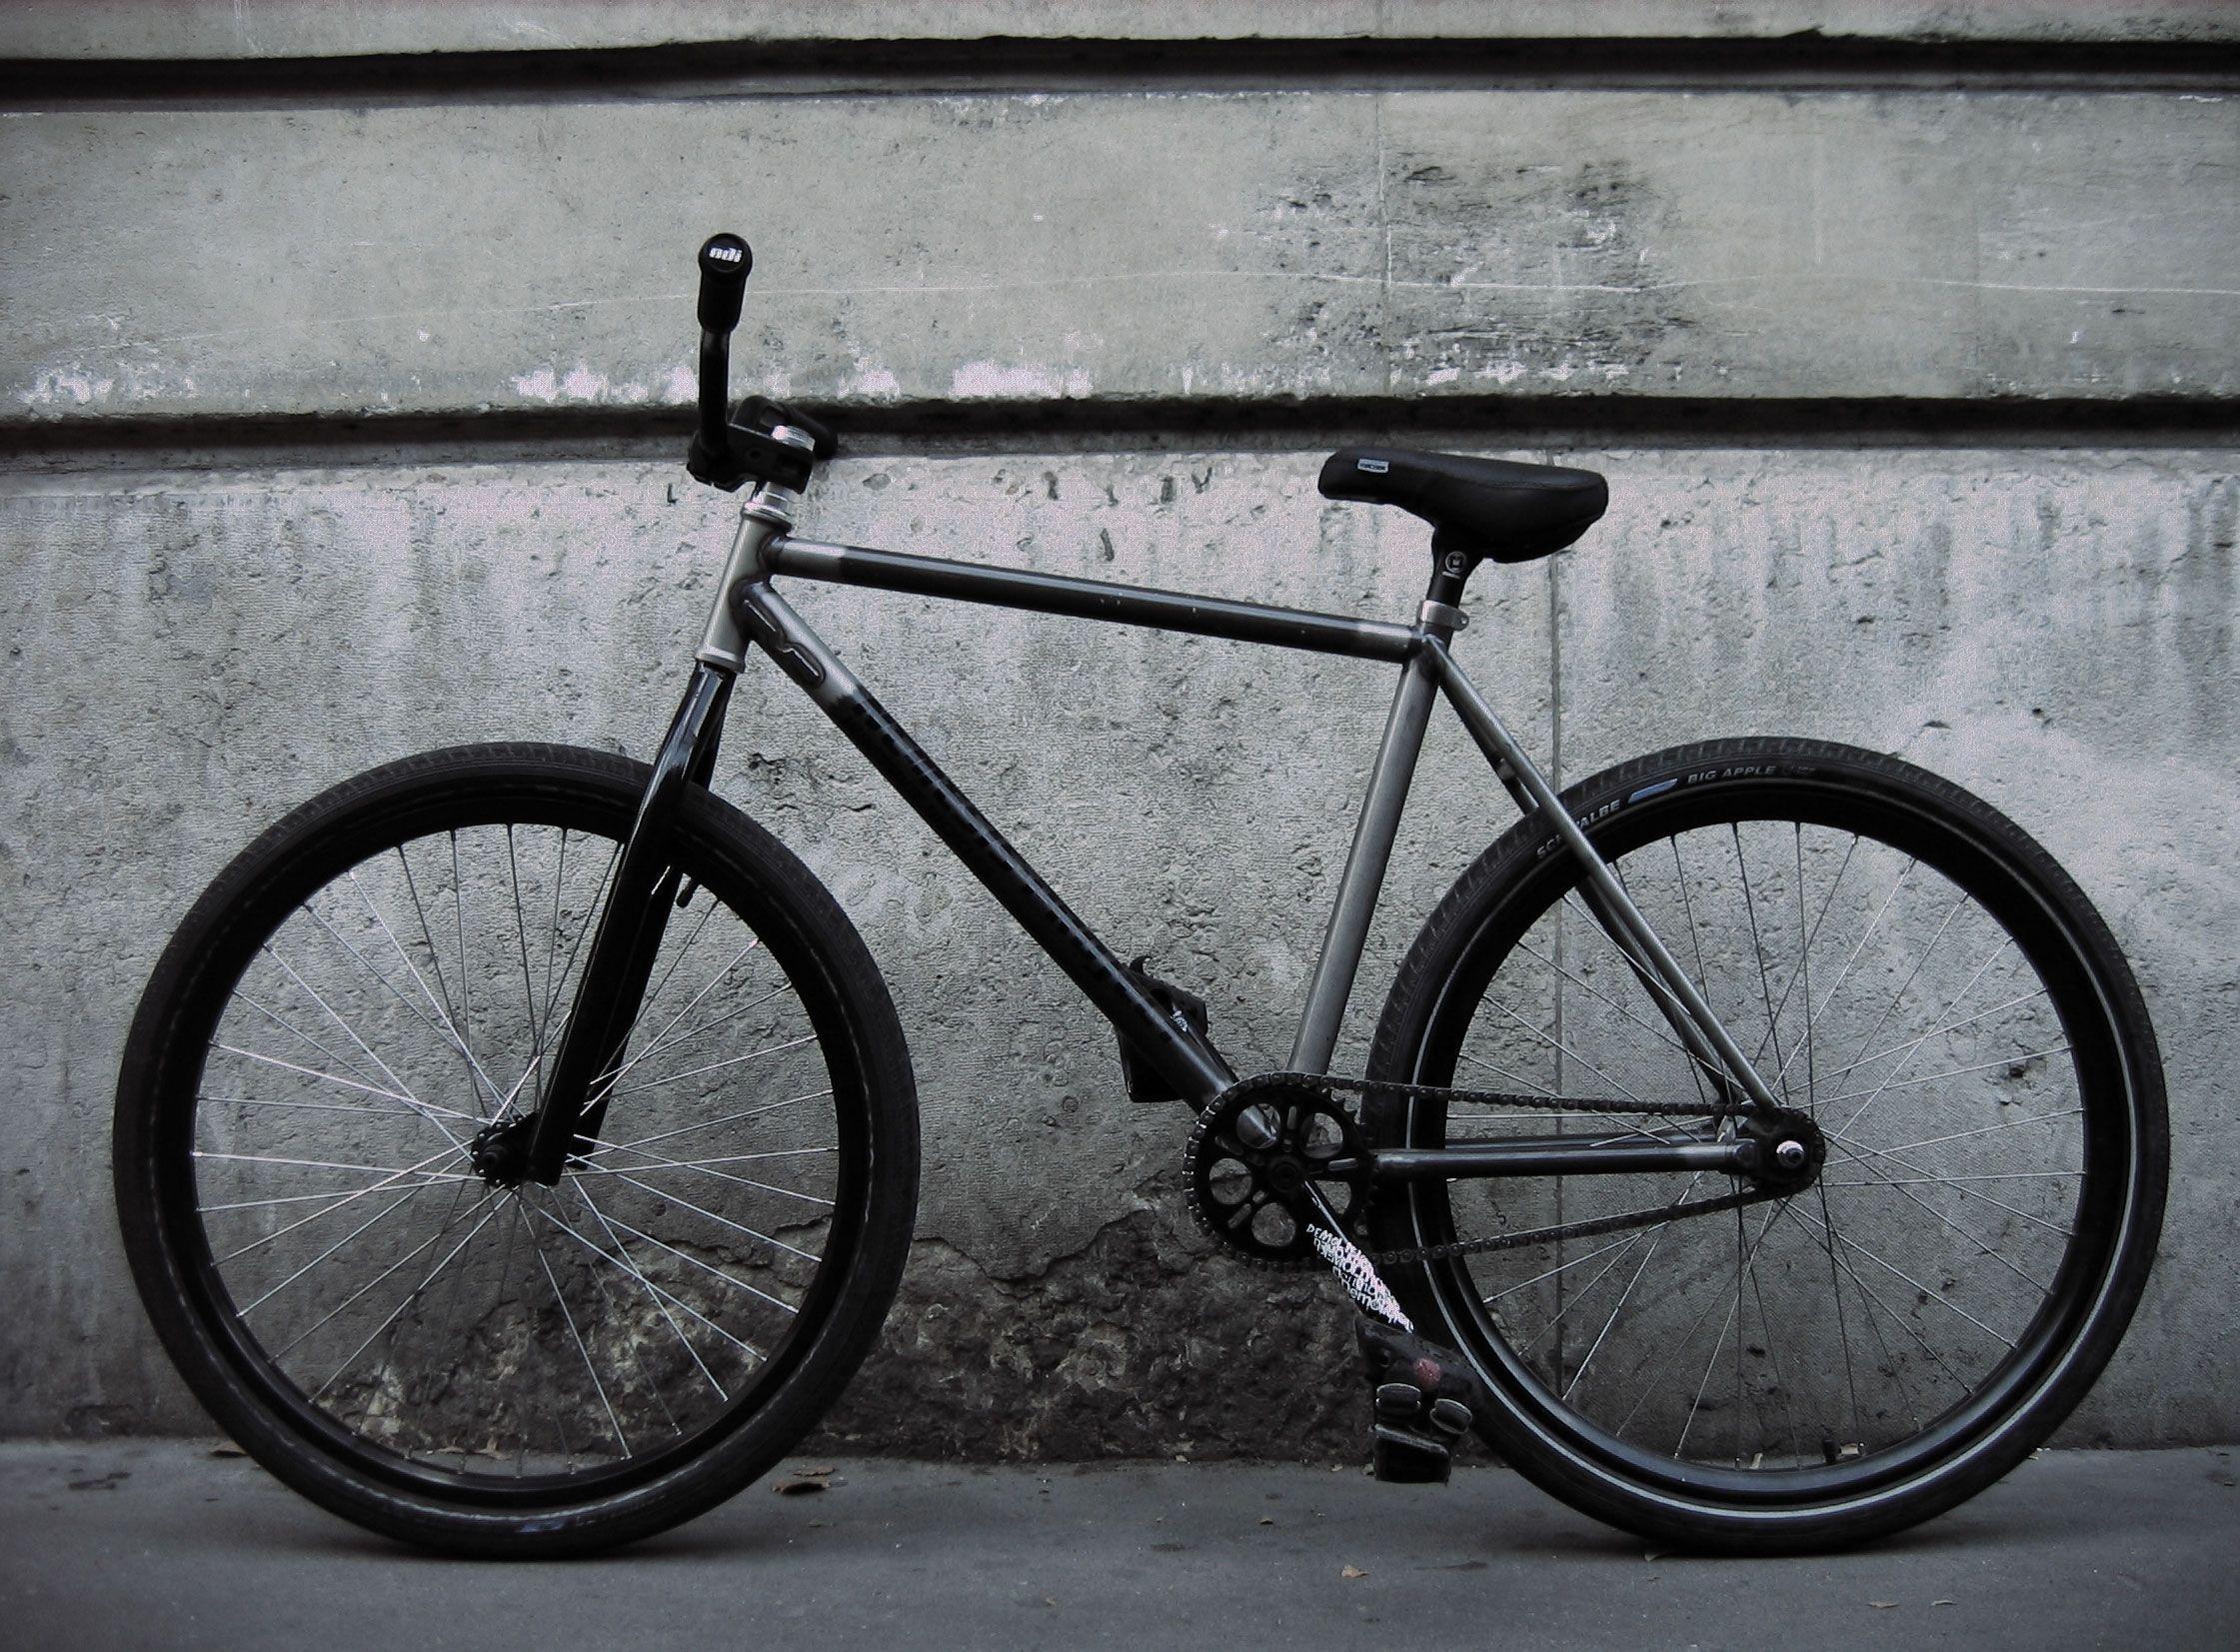 schwalbe big apple   Cyclocross/monster cross   Pinterest   MTB and ...